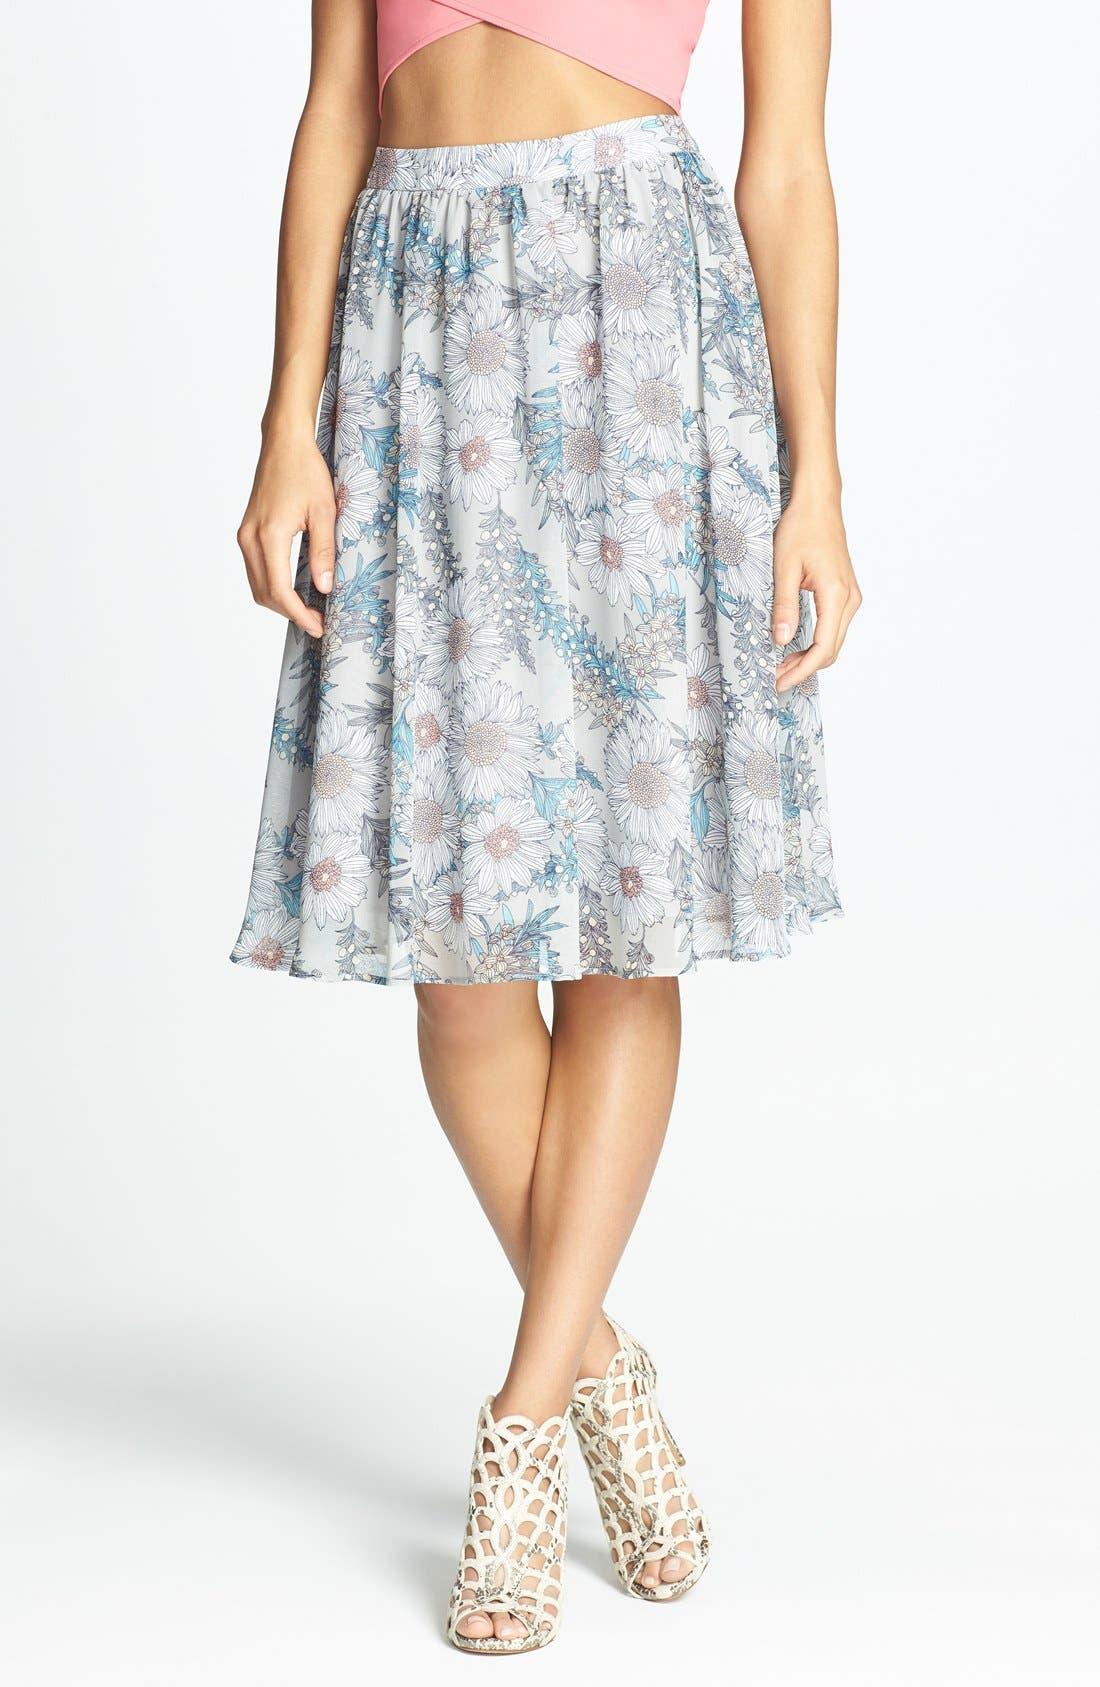 Alternate Image 1 Selected - ASTR Floral Print High Rise Midi Skirt